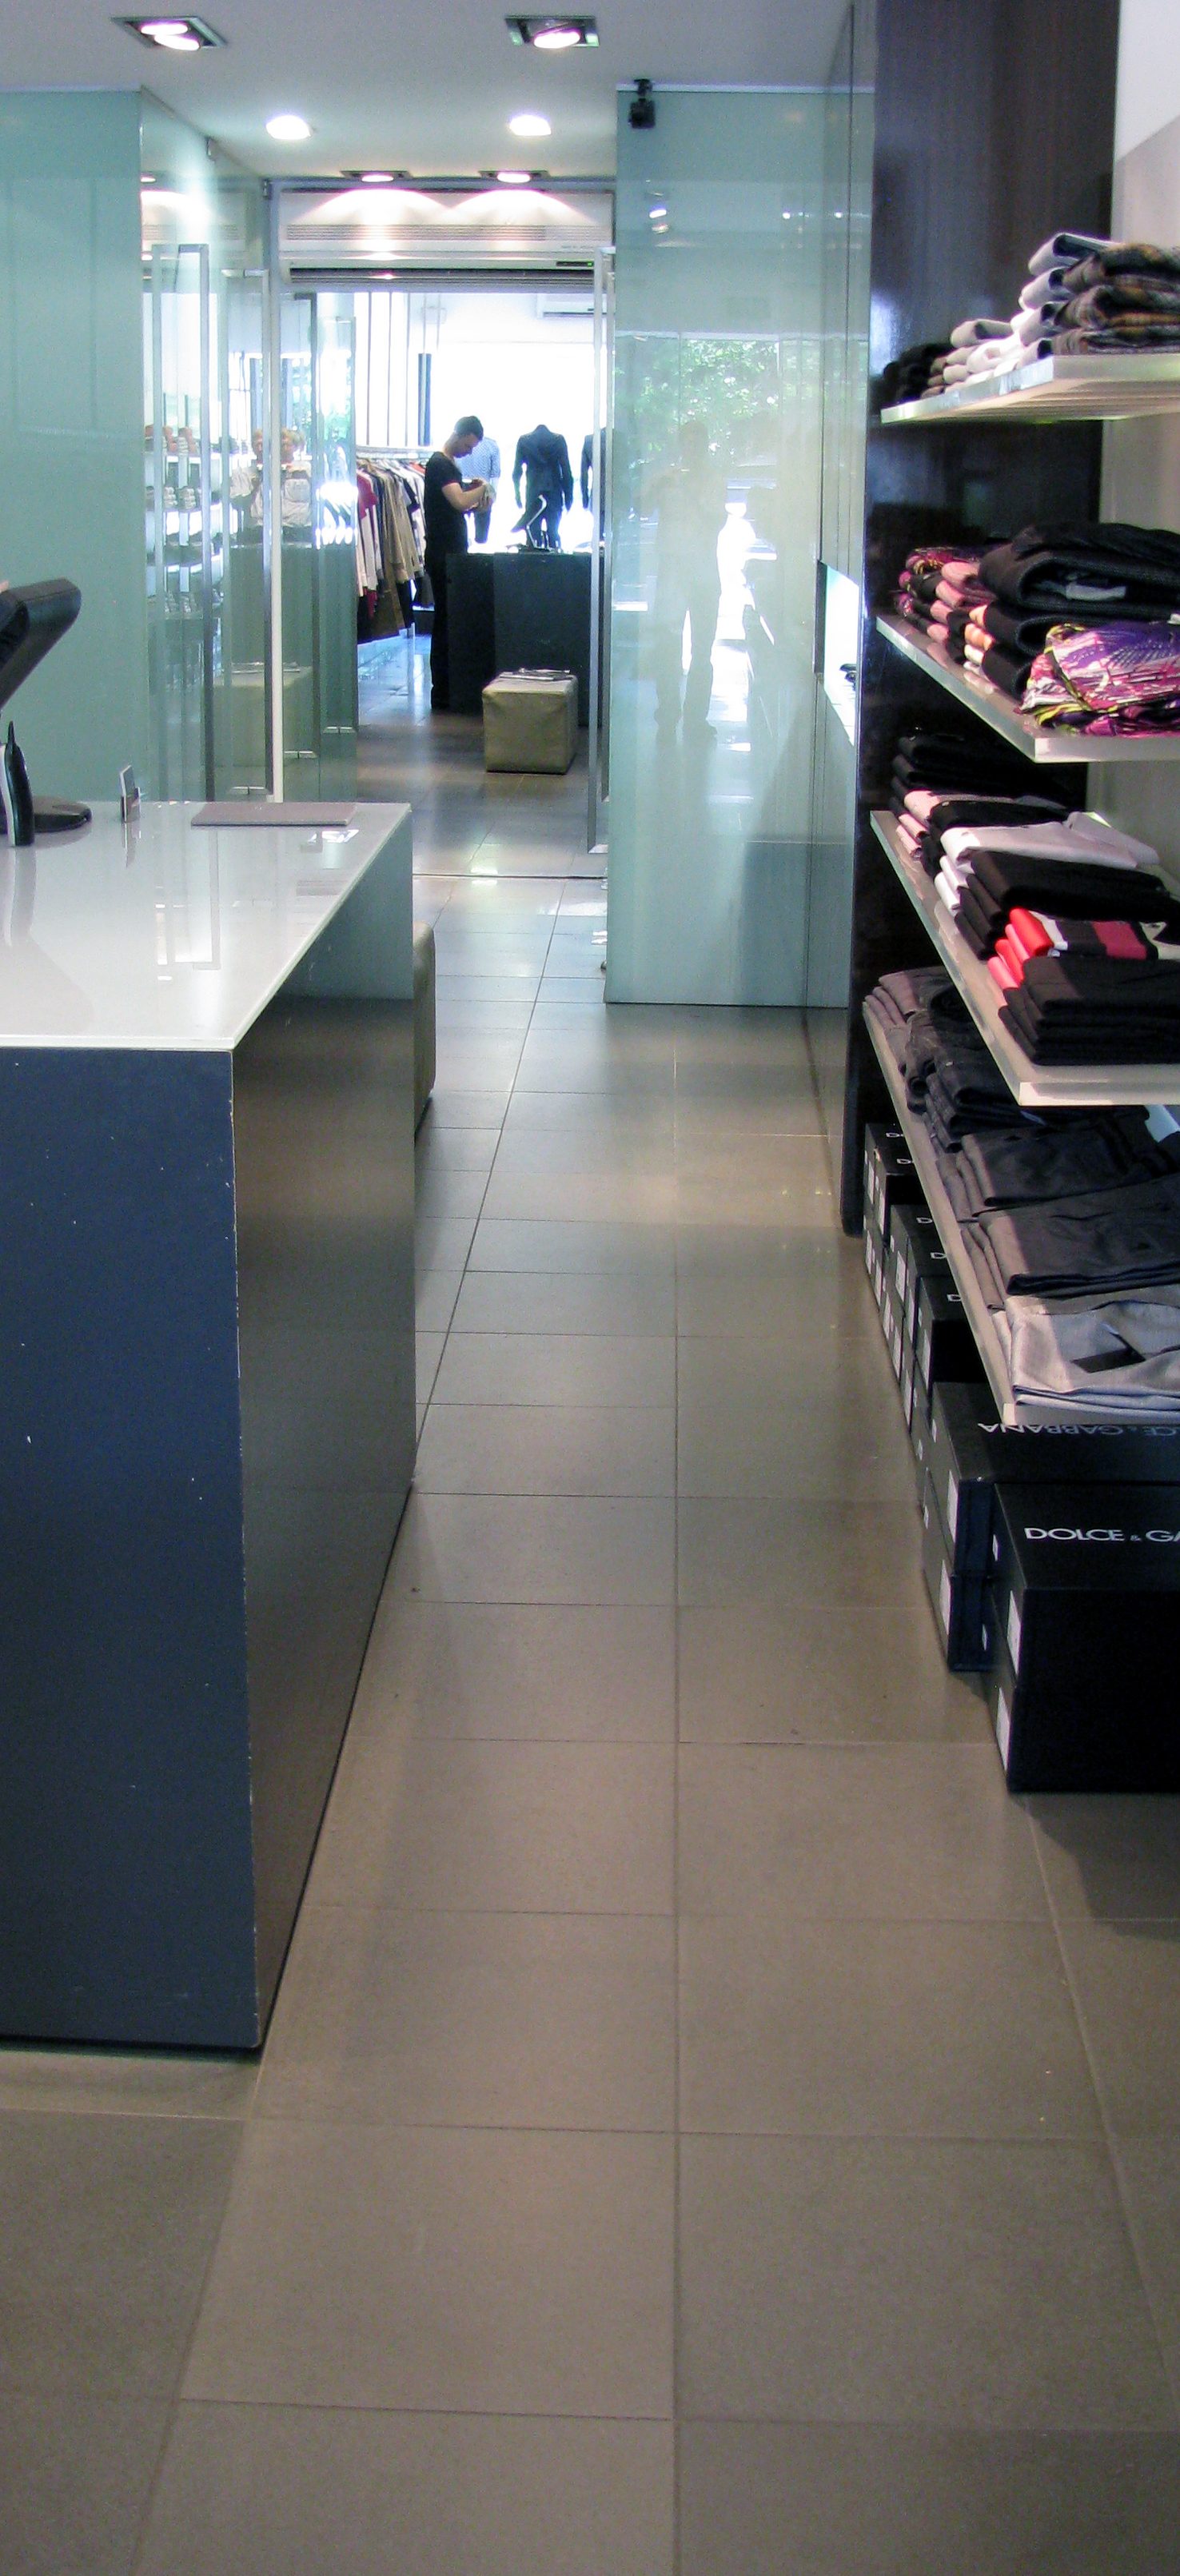 Menswear Store, Paddington